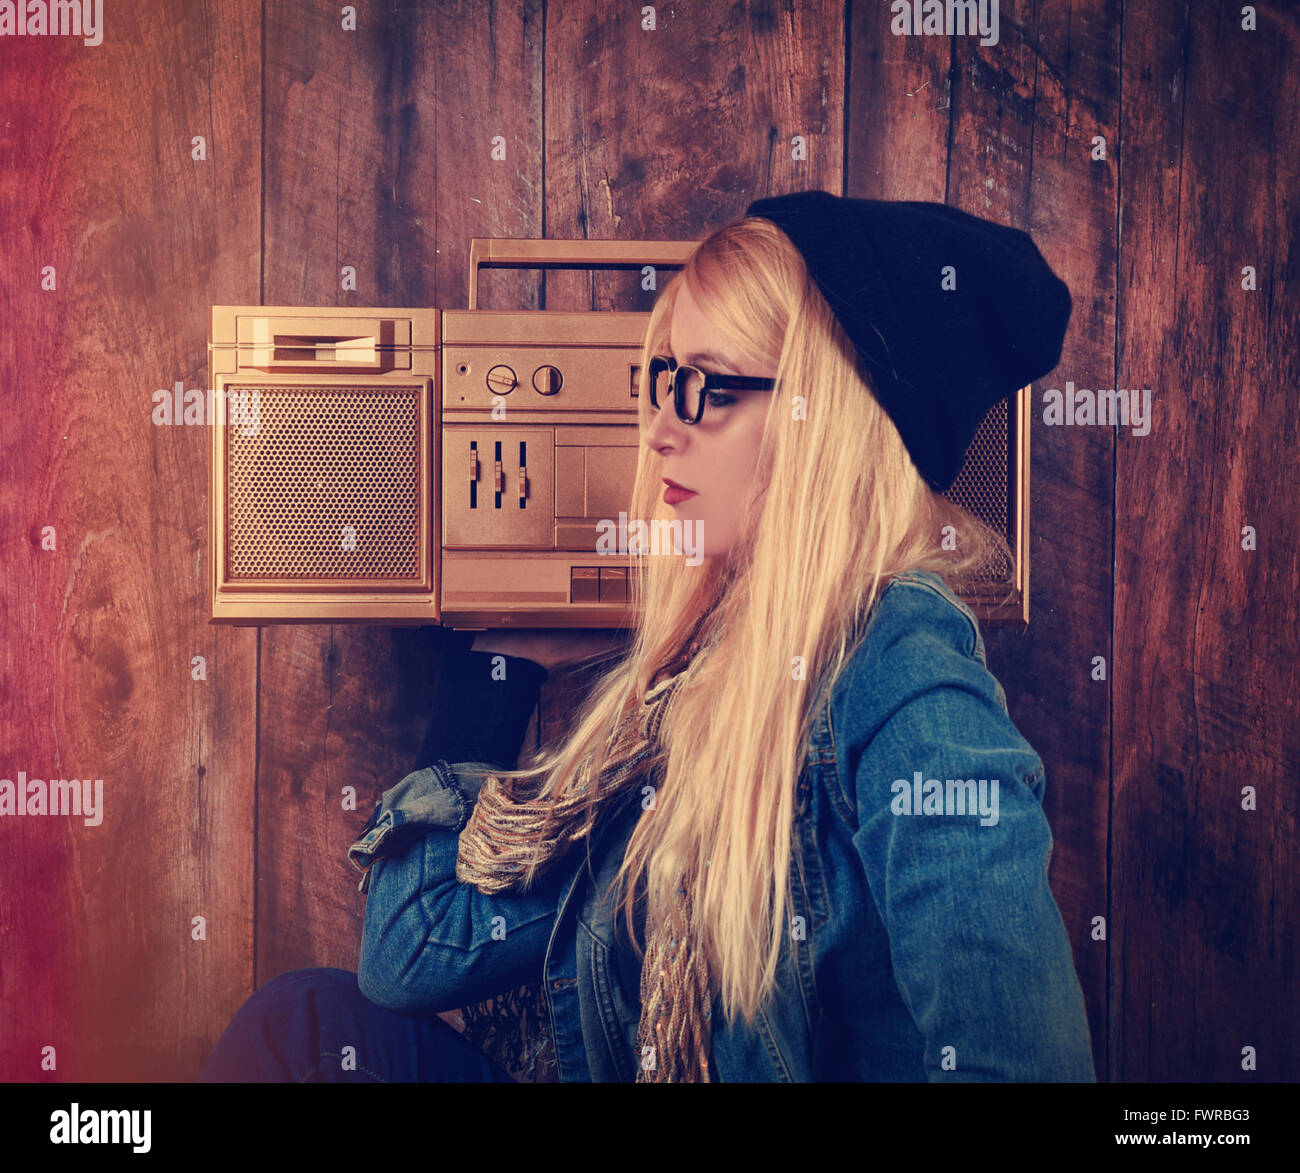 Un hipster chica con gafas es escuchar una vendimia oro boombox radio con un altavoz para un concepto de entretenimiento musical Foto de stock